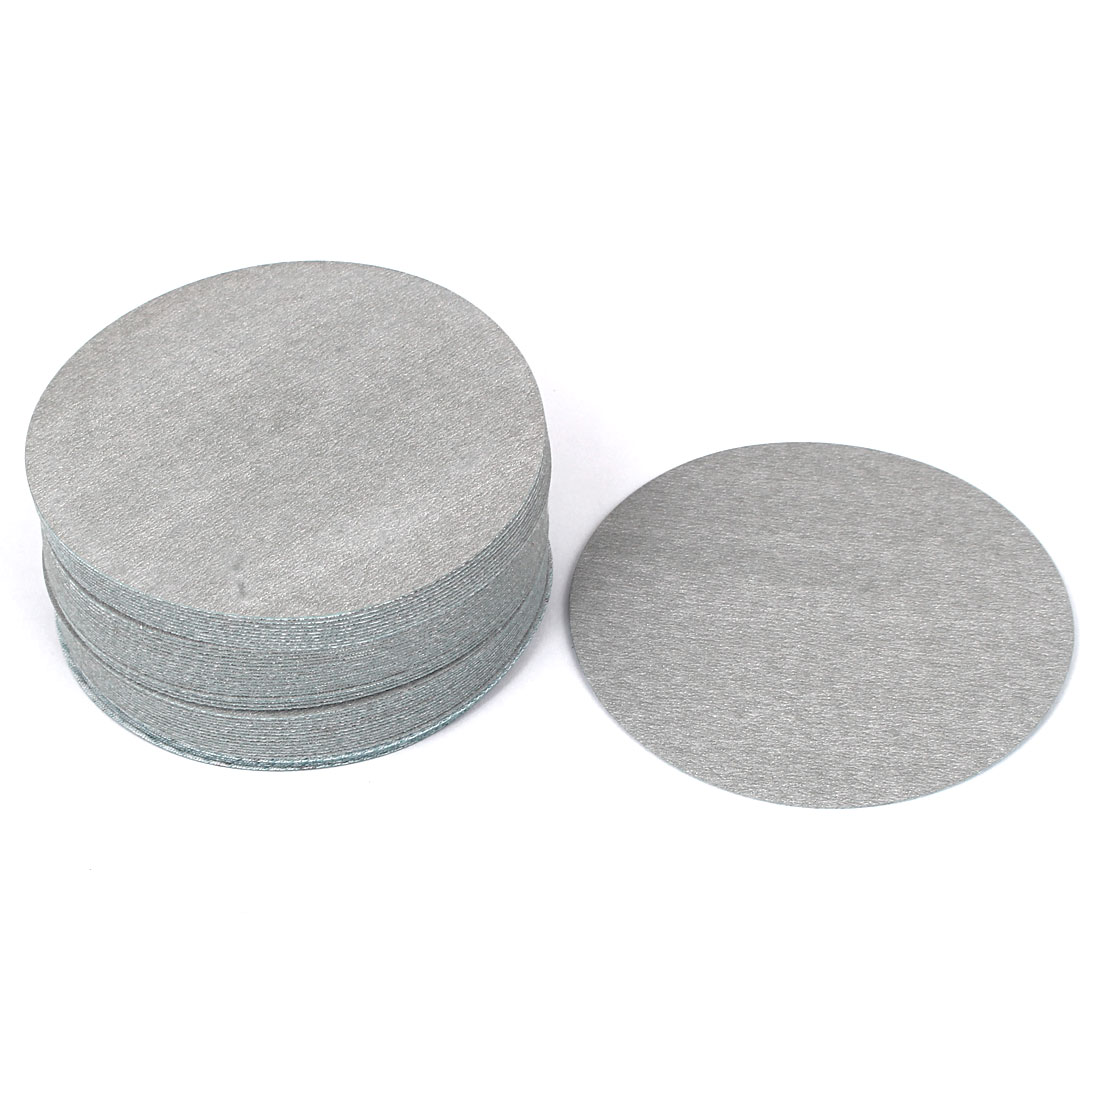 "4"" Dia Polishing Round Dry Abrasive Sanding Sandpaper Sheet Disc 800 Grit 50pcs"